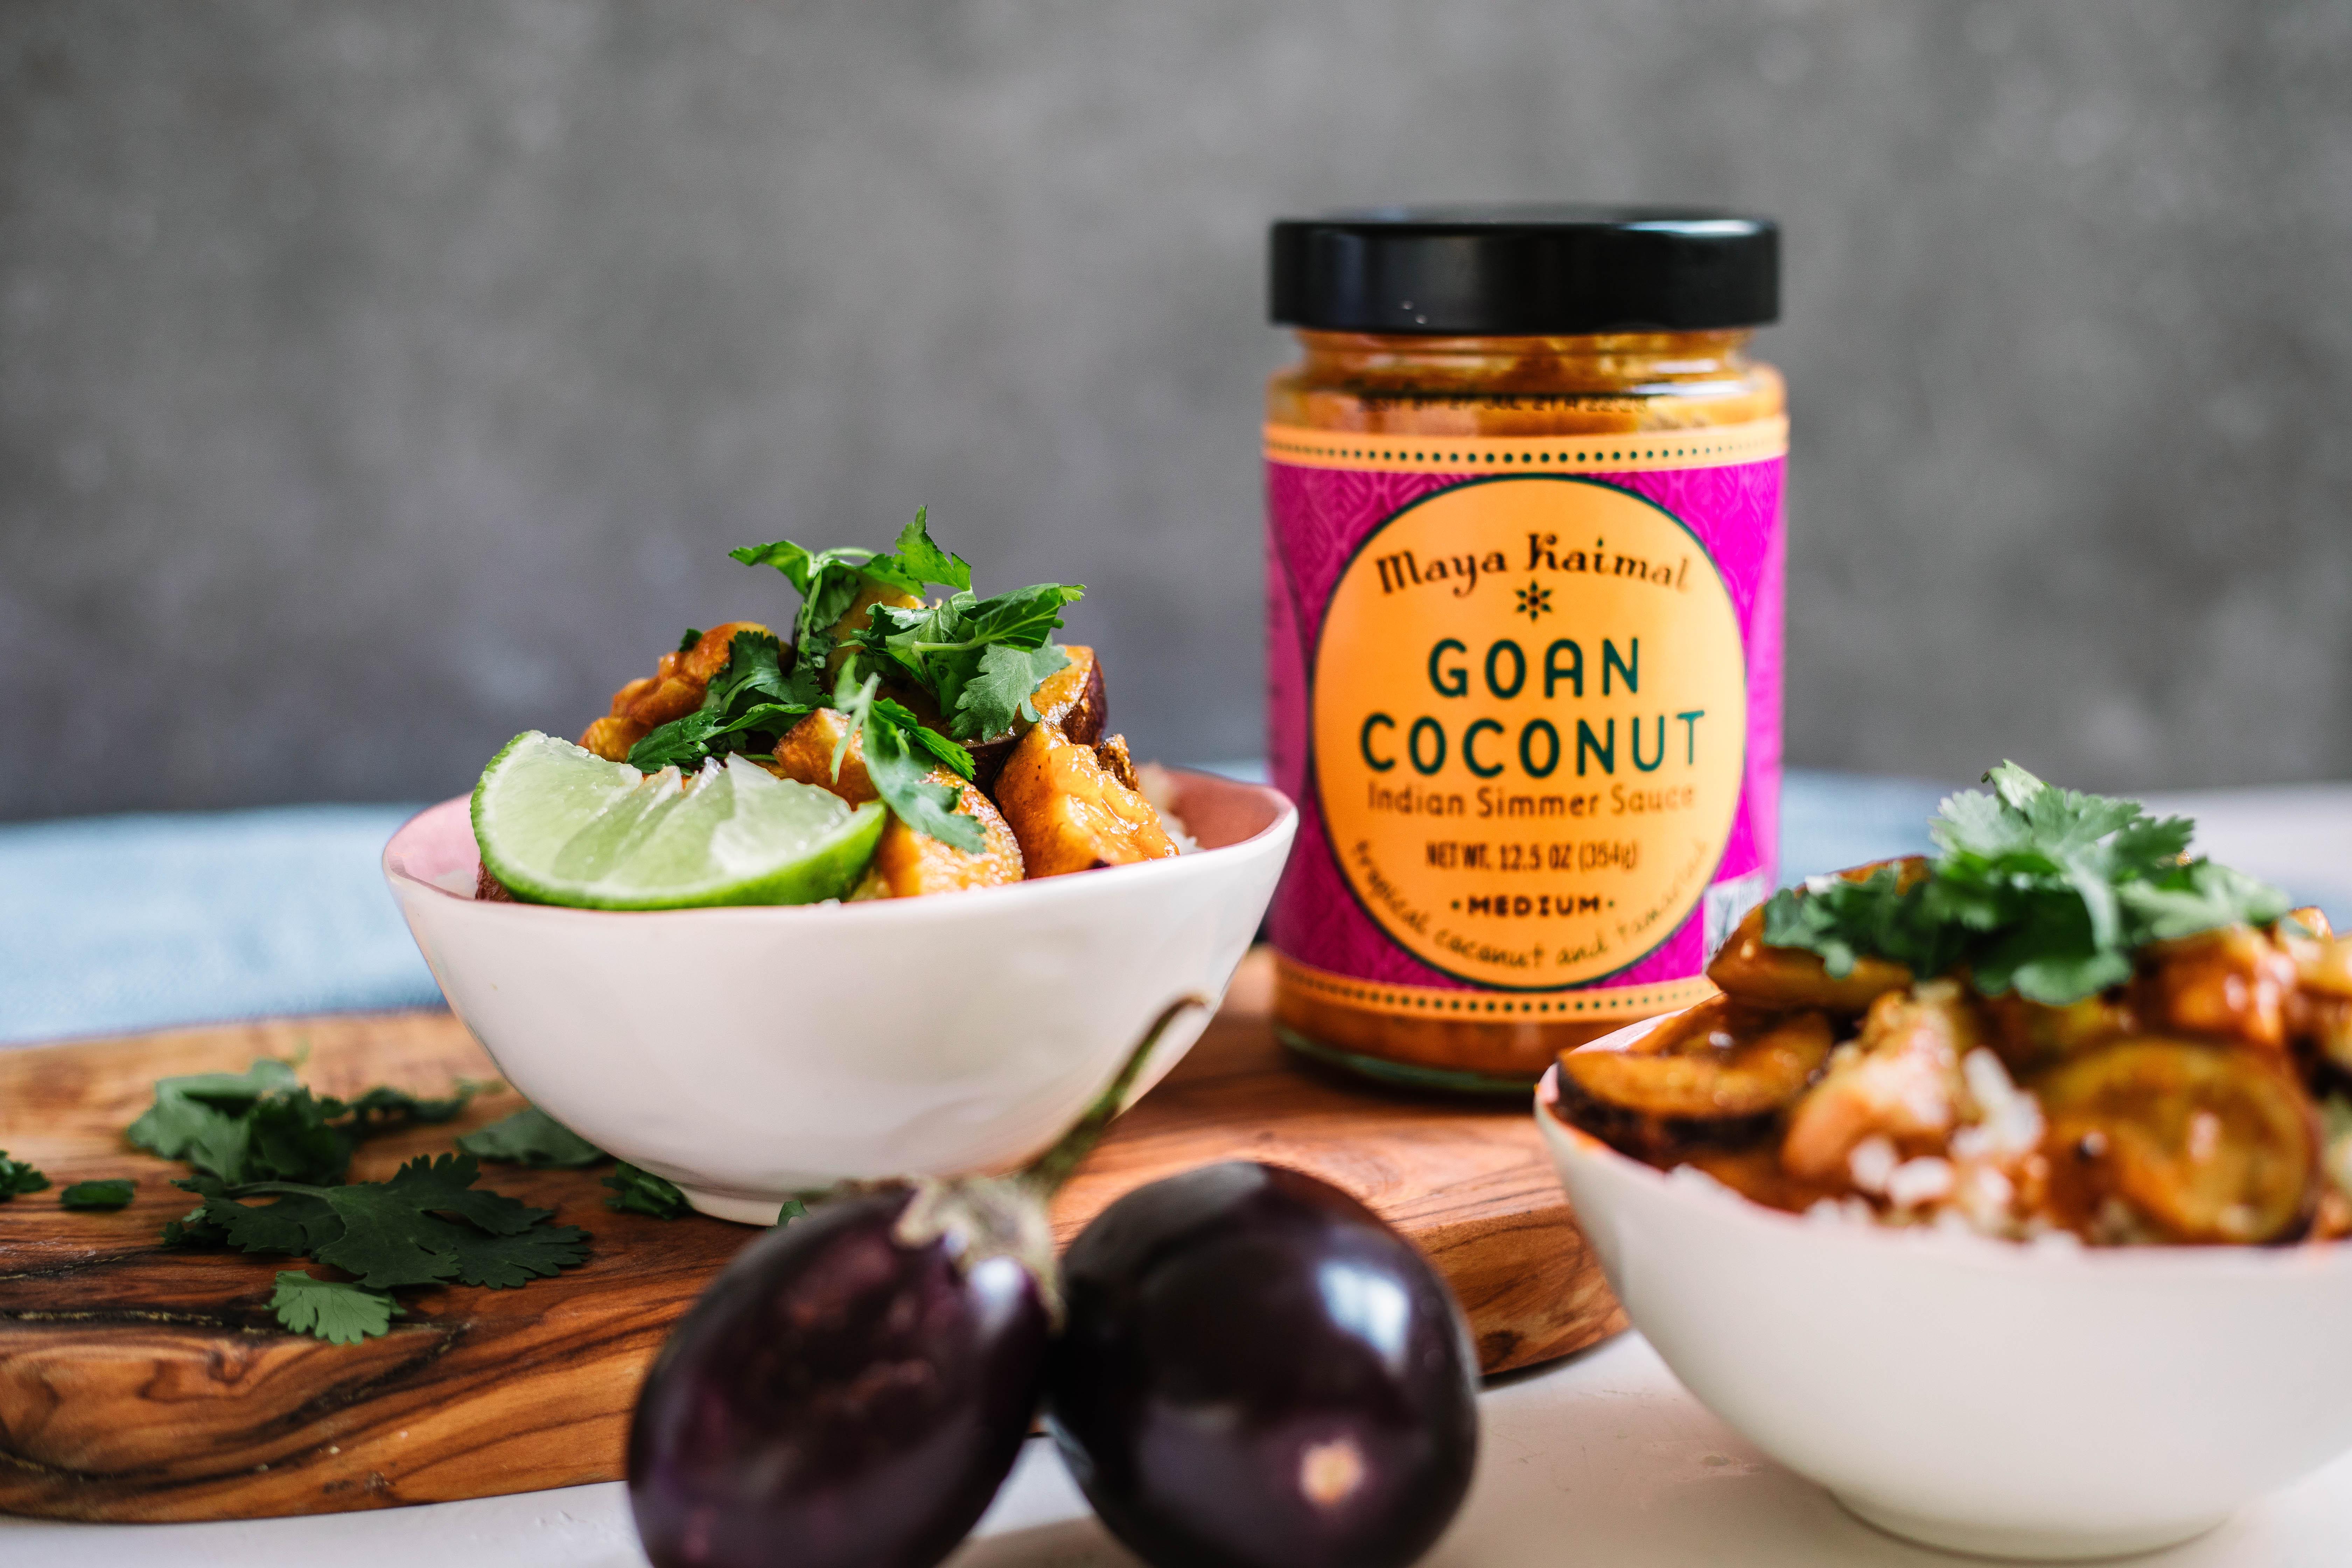 Crispy Goan Coconut Chicken & Eggplant With Cauliflower Rice